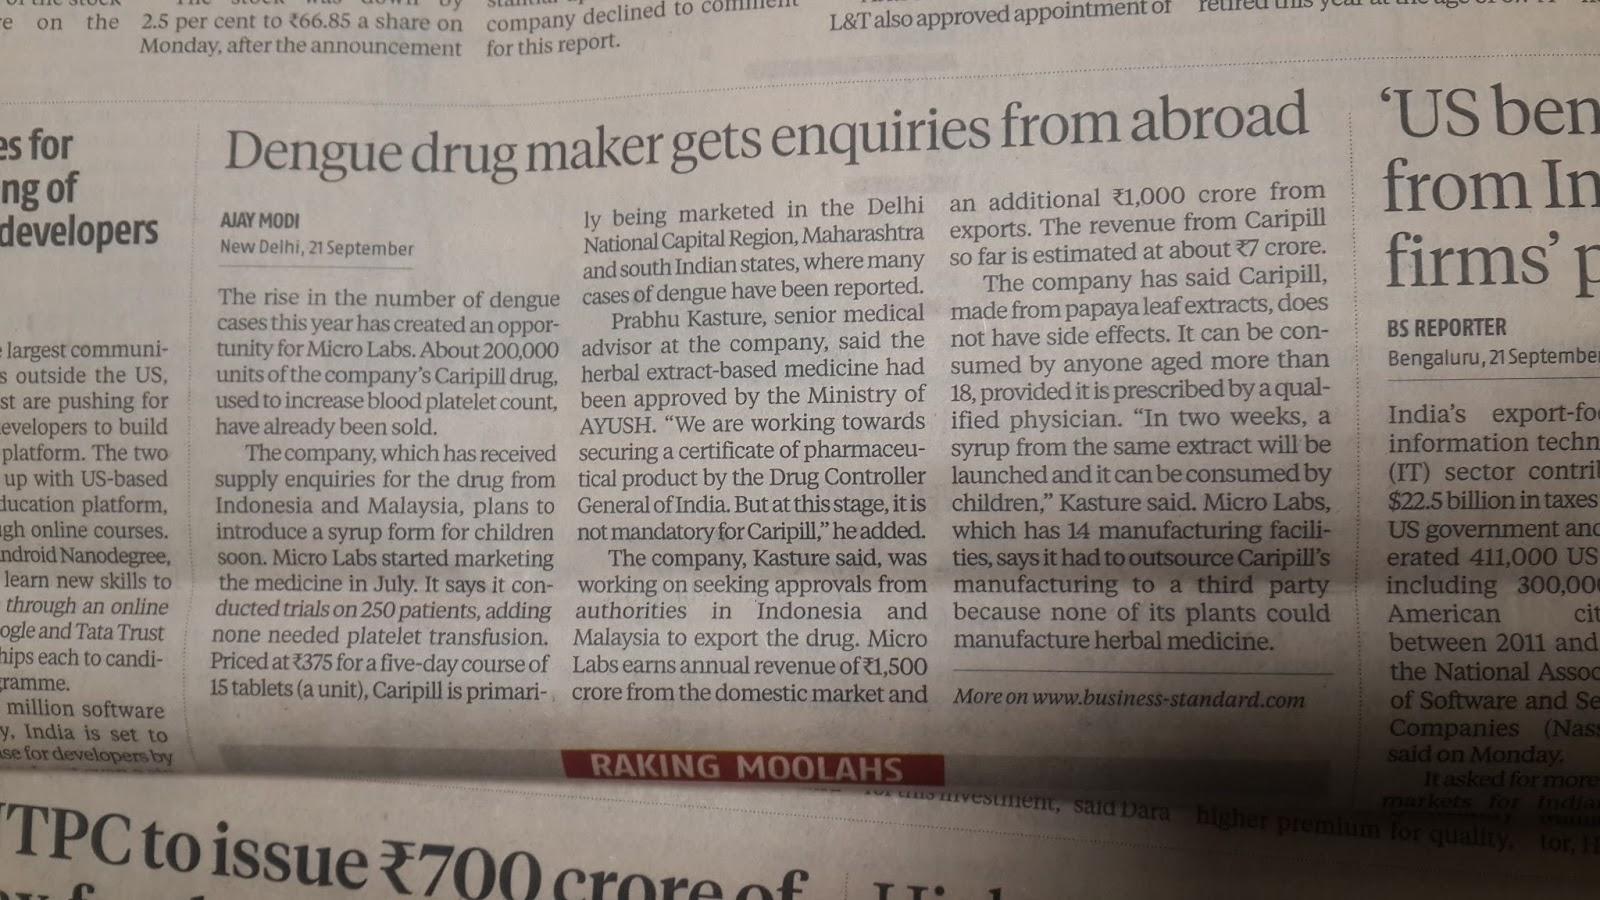 PHARMACEUTICALS AND HEALTHCARE: Indian pharma entrepreneurs always